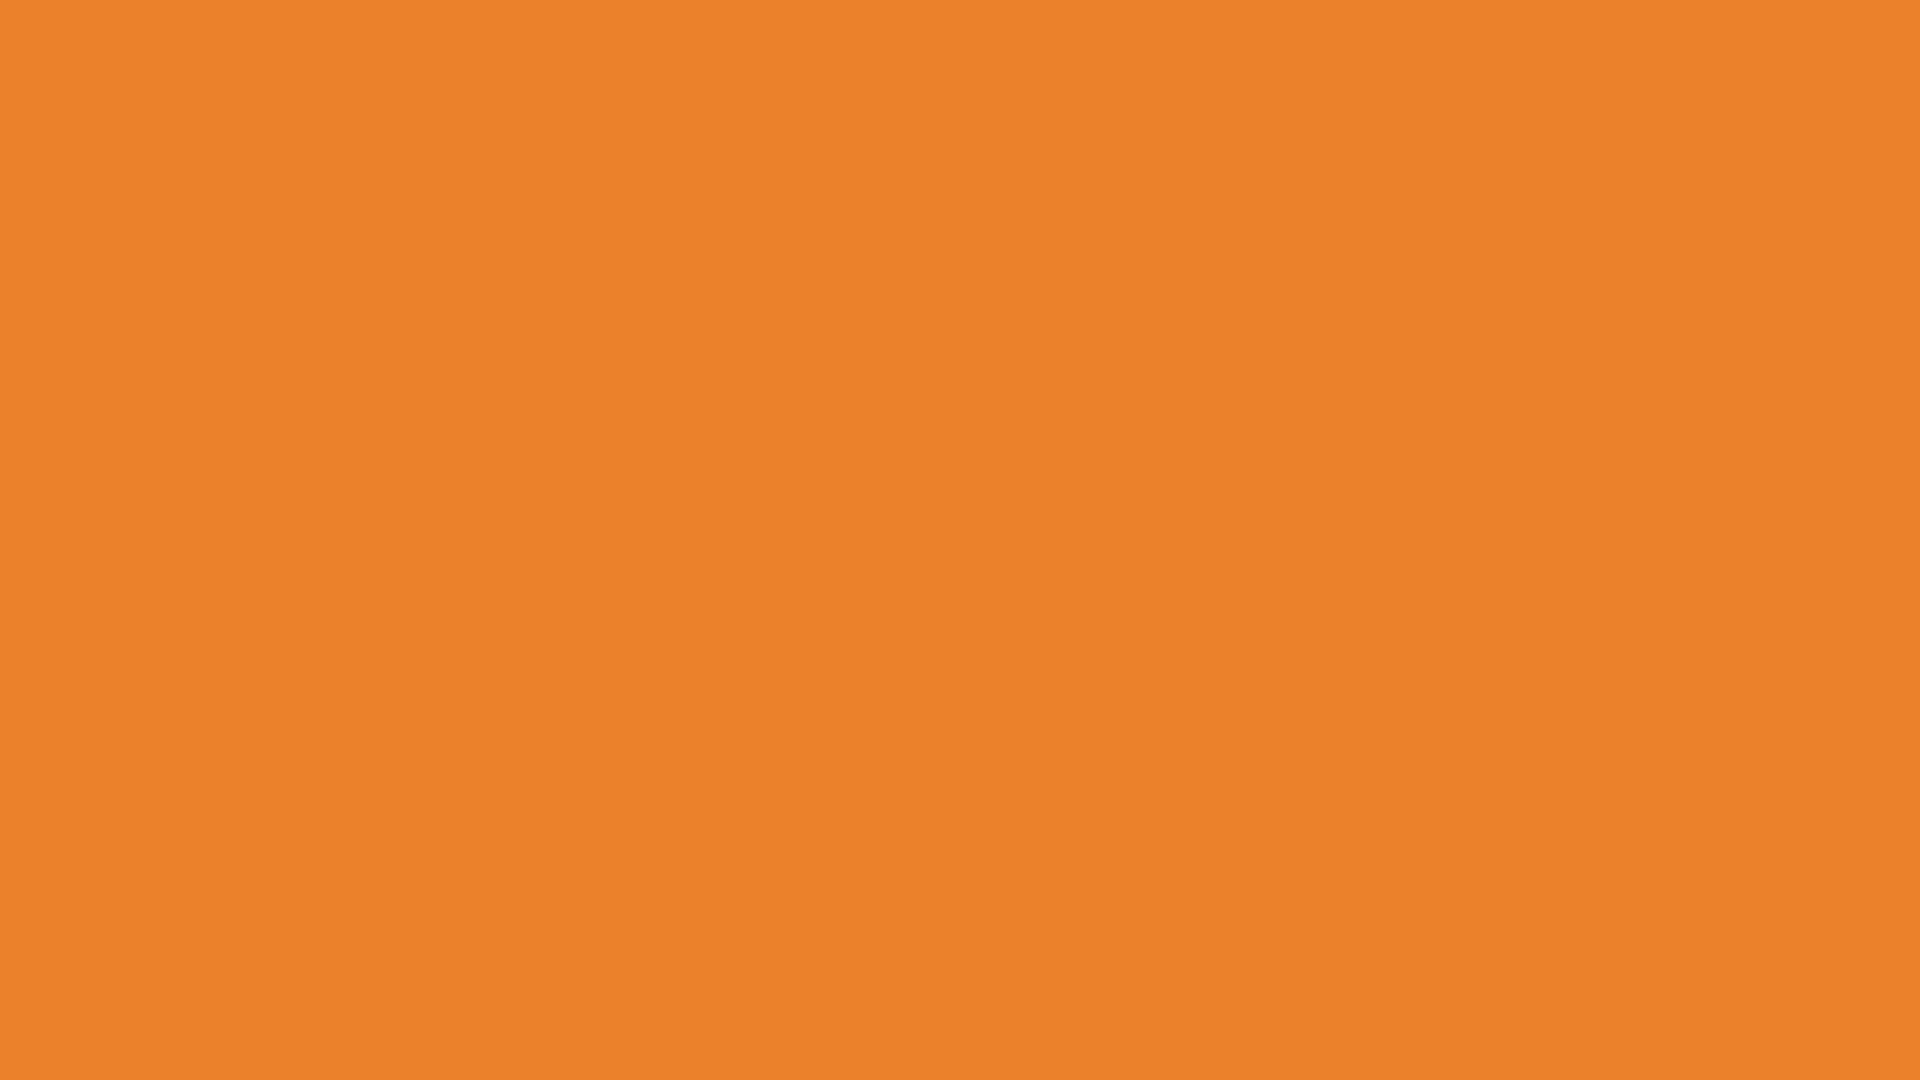 Orange box.